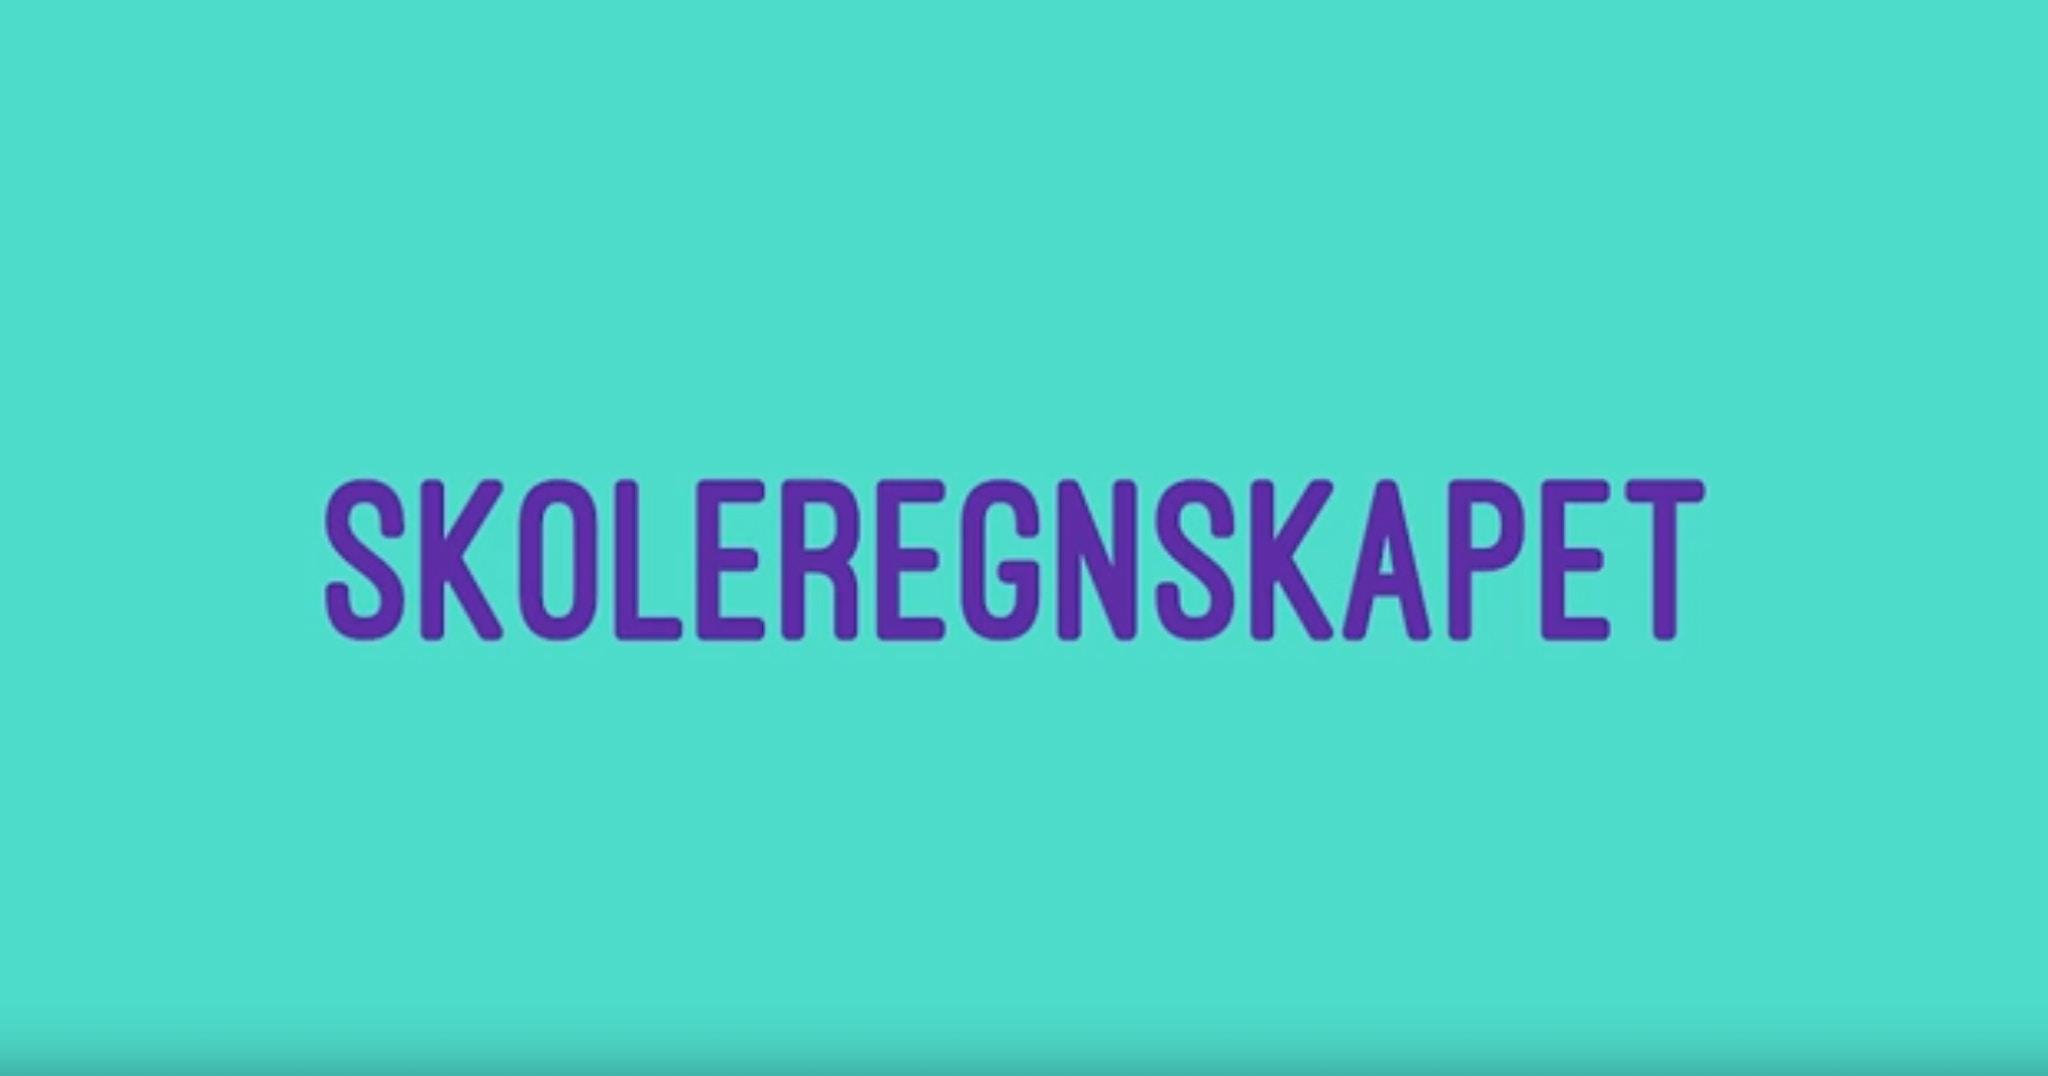 Skoleregnskap_film